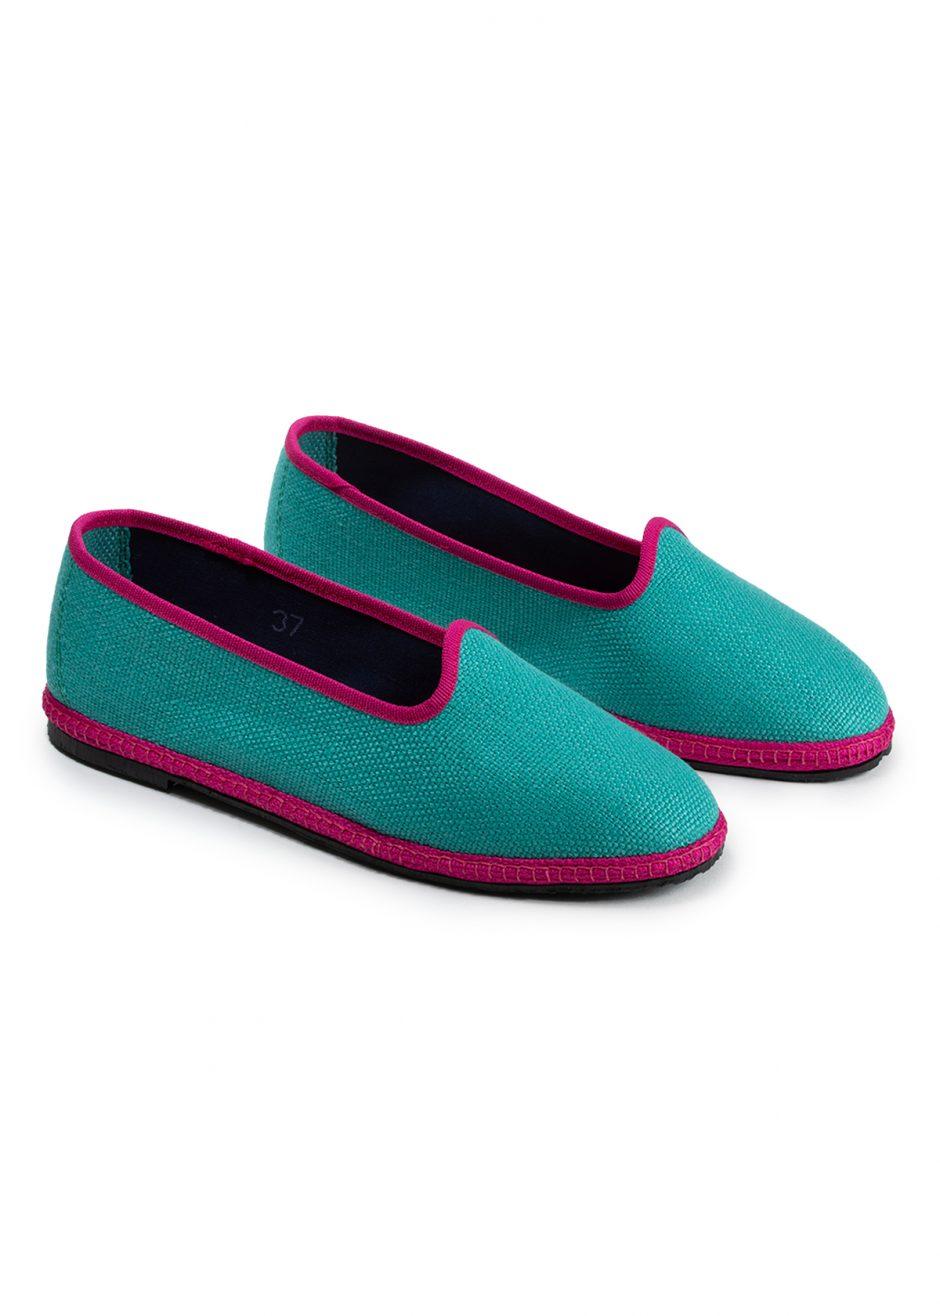 Daisy – Furlana turquoise linen